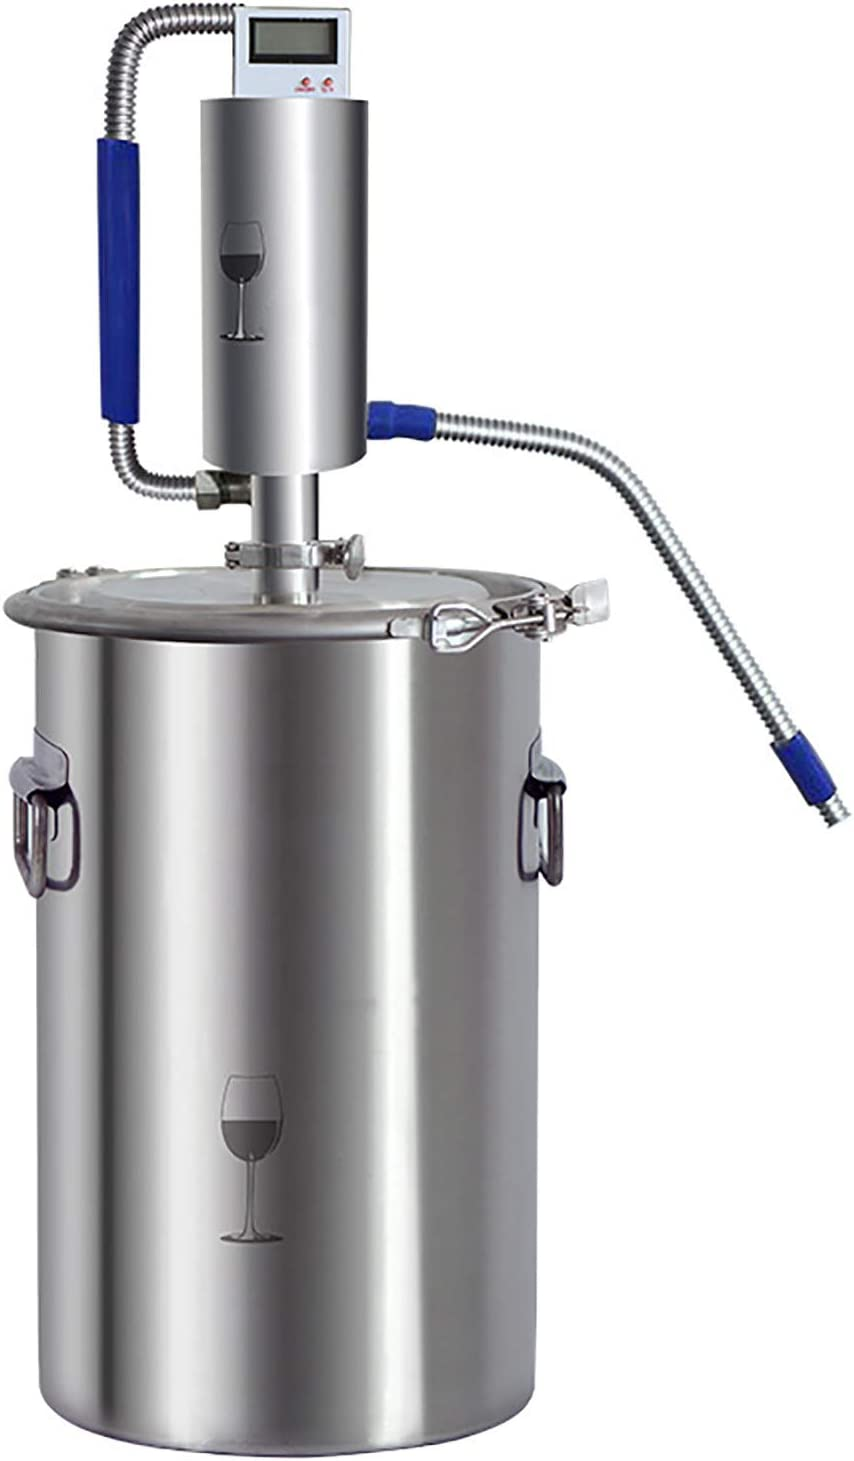 CLING Destilador de Alcohol Moonshine Still Kit Destilador de Aceite Esencial para el hogar, Acero Inoxidable, Sello Alto con para Bricolaje, Whisky, Brandy, Agua destilada, hidrolatos, Vino